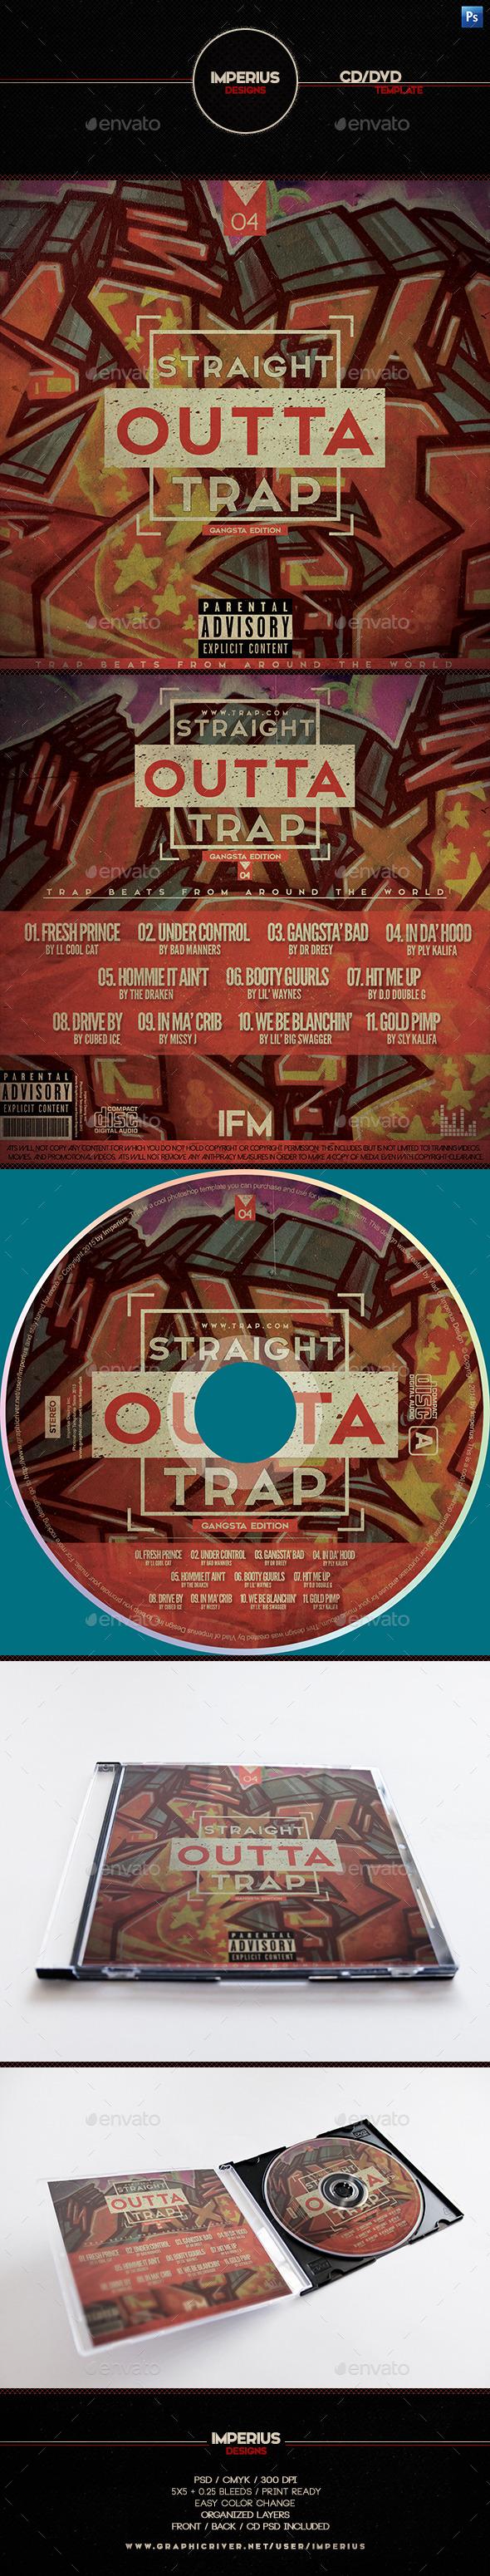 Trap V4 CD/DVD Cover - CD & DVD Artwork Print Templates